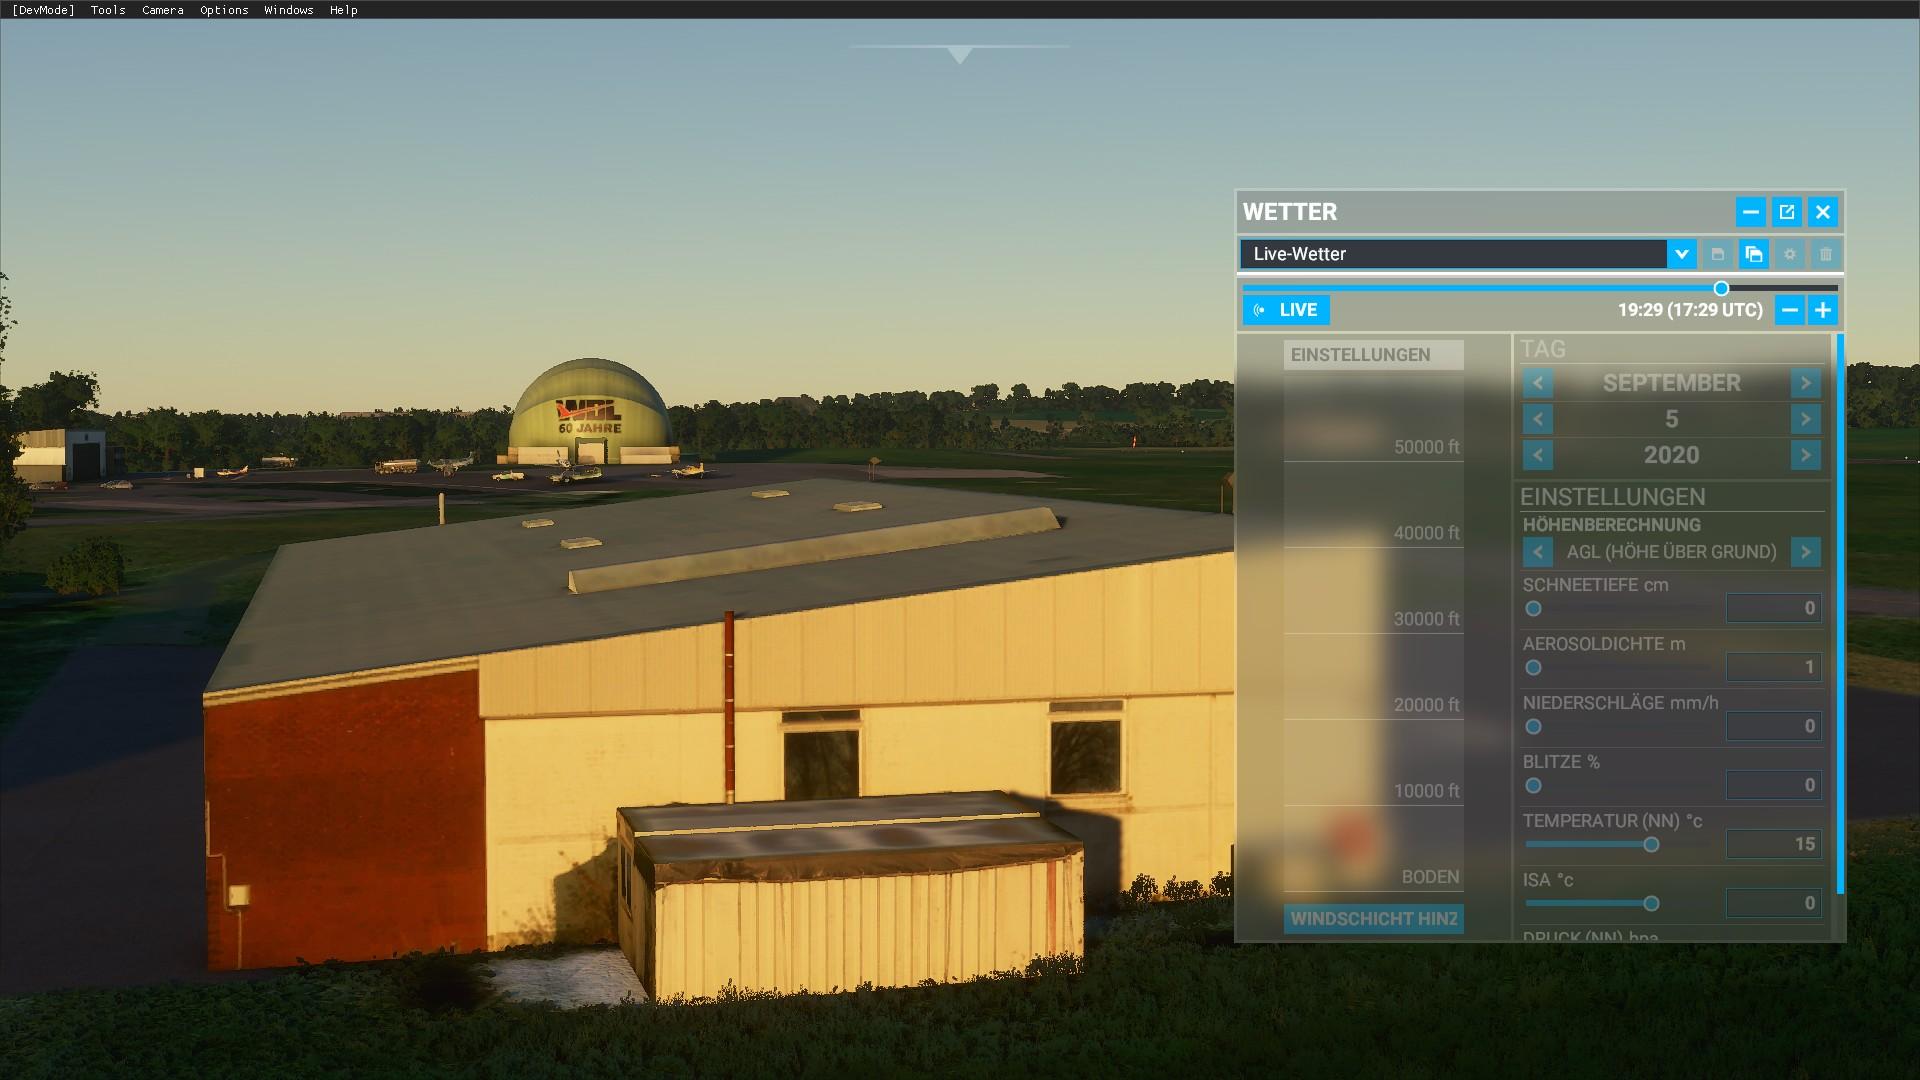 mfs_flughafen_edle_hangar_blimp_7.jpg